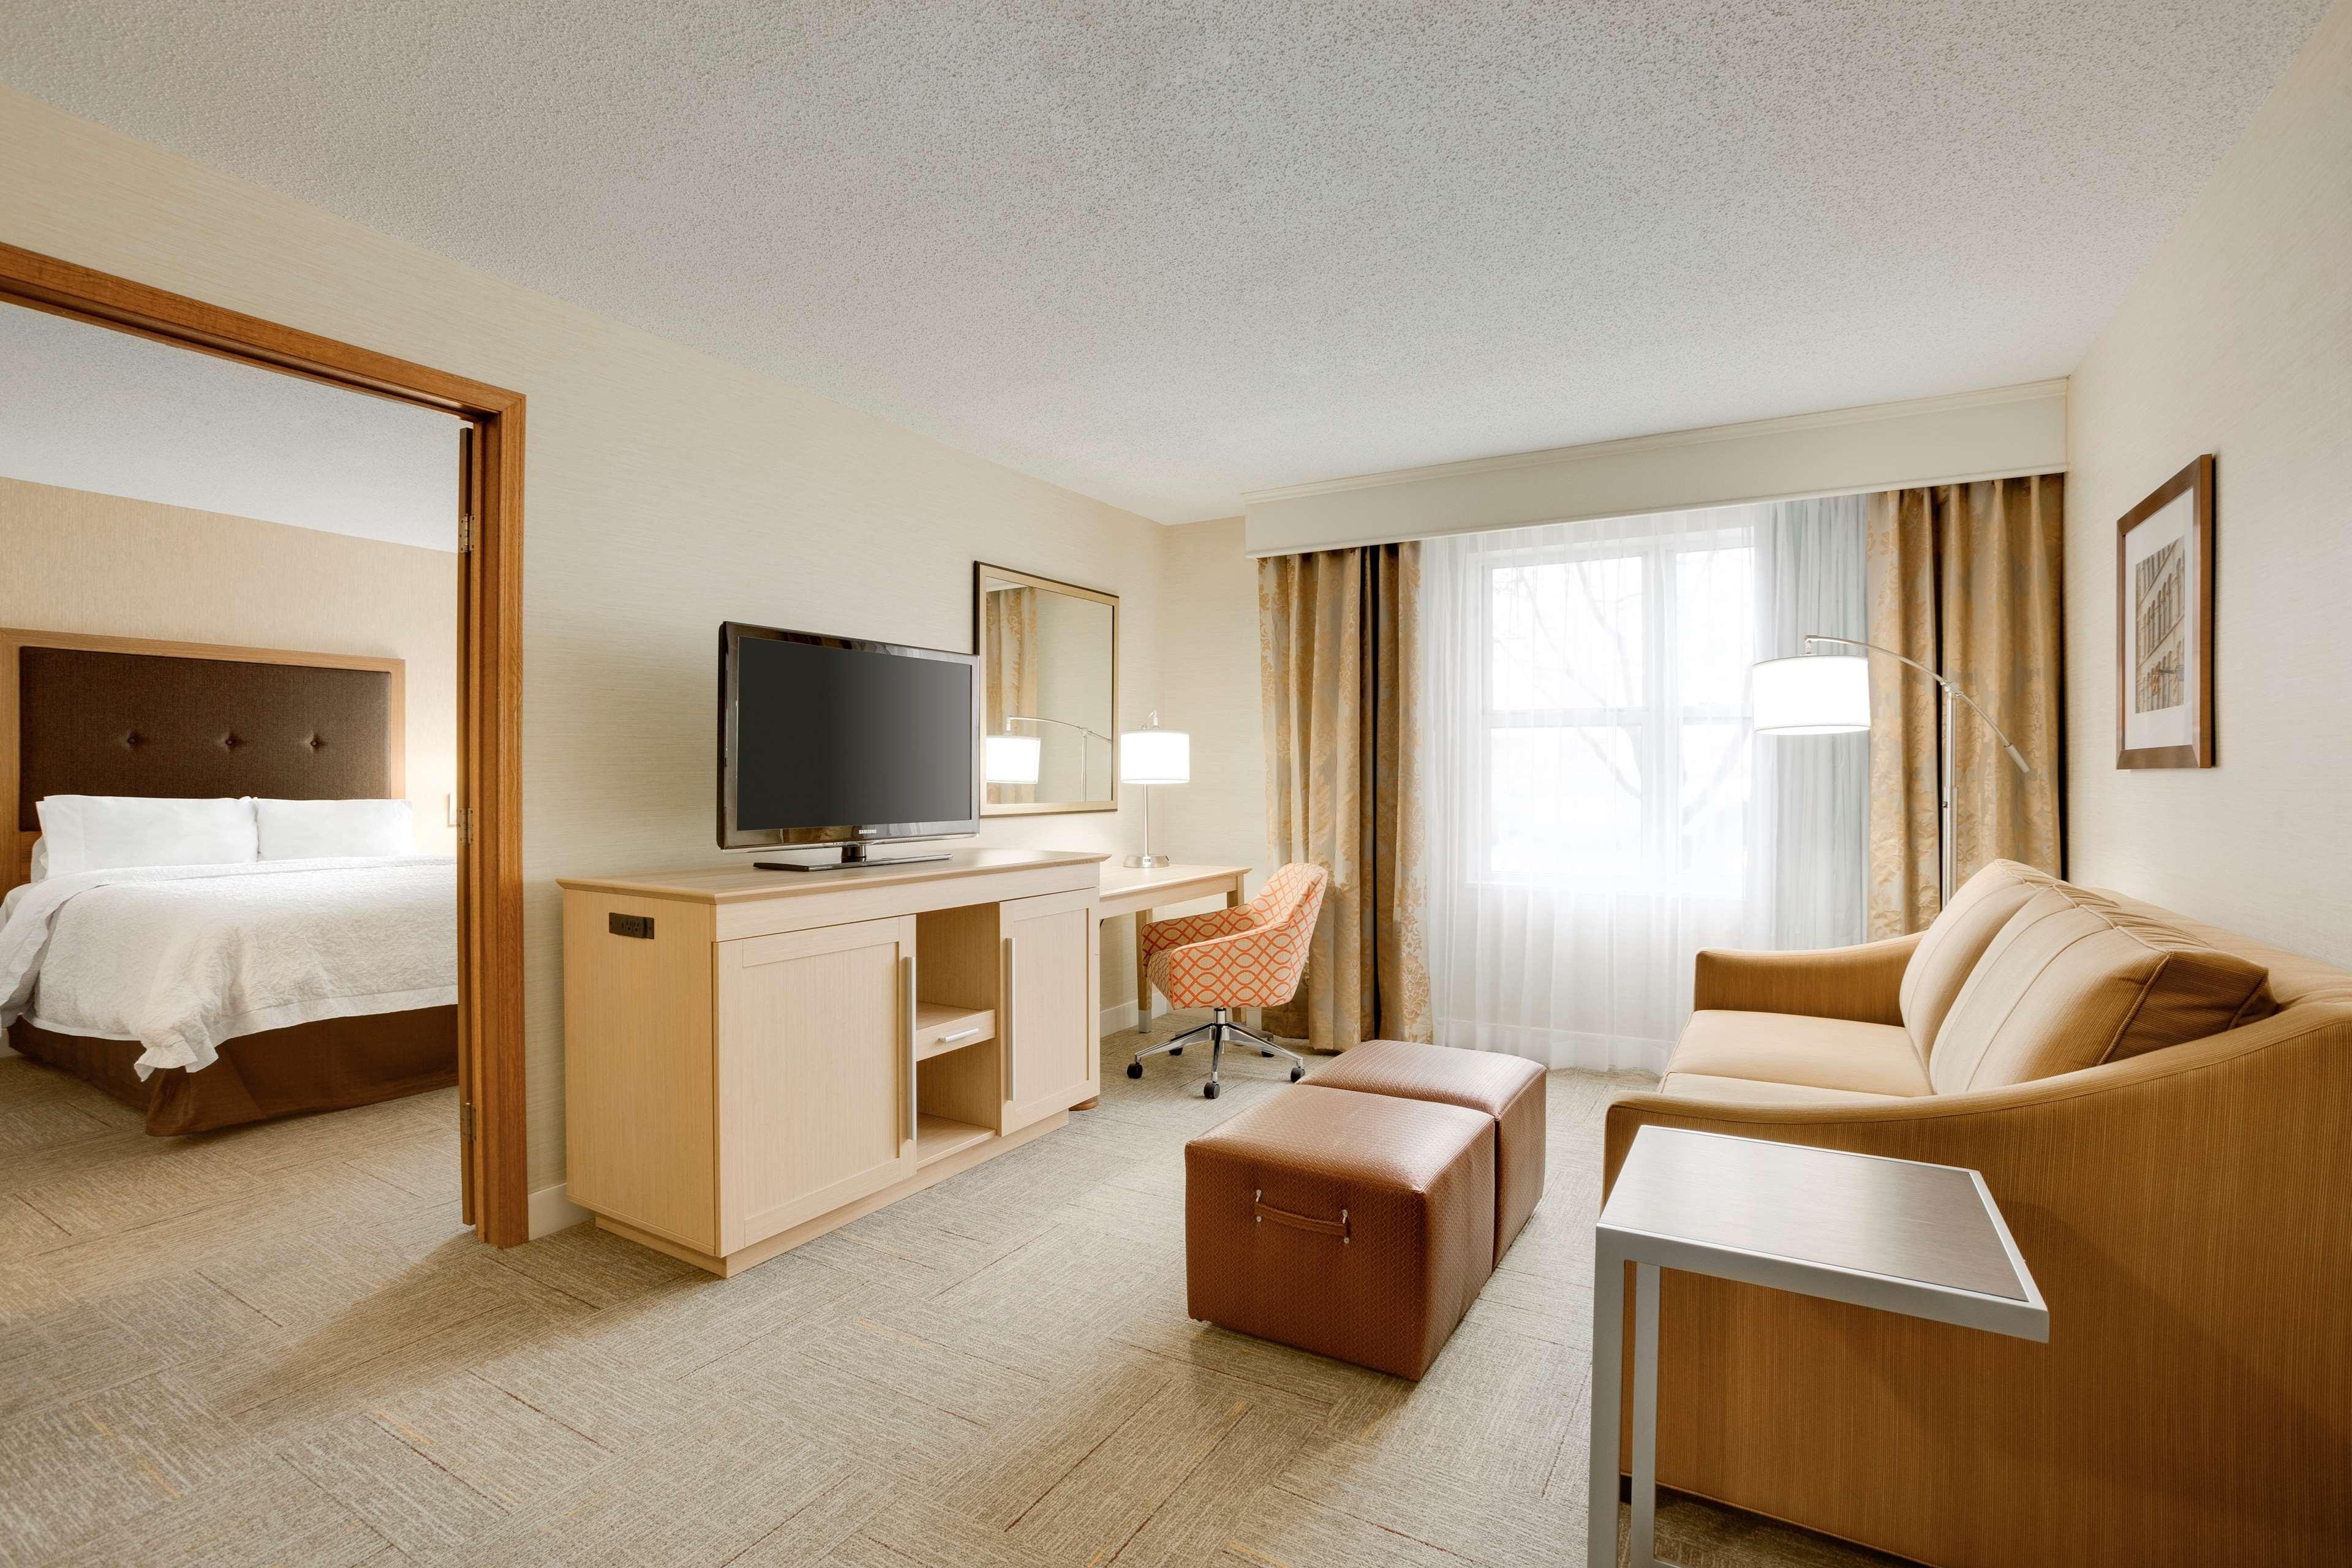 Hampton Inn & Suites Cleveland/Independence image 19